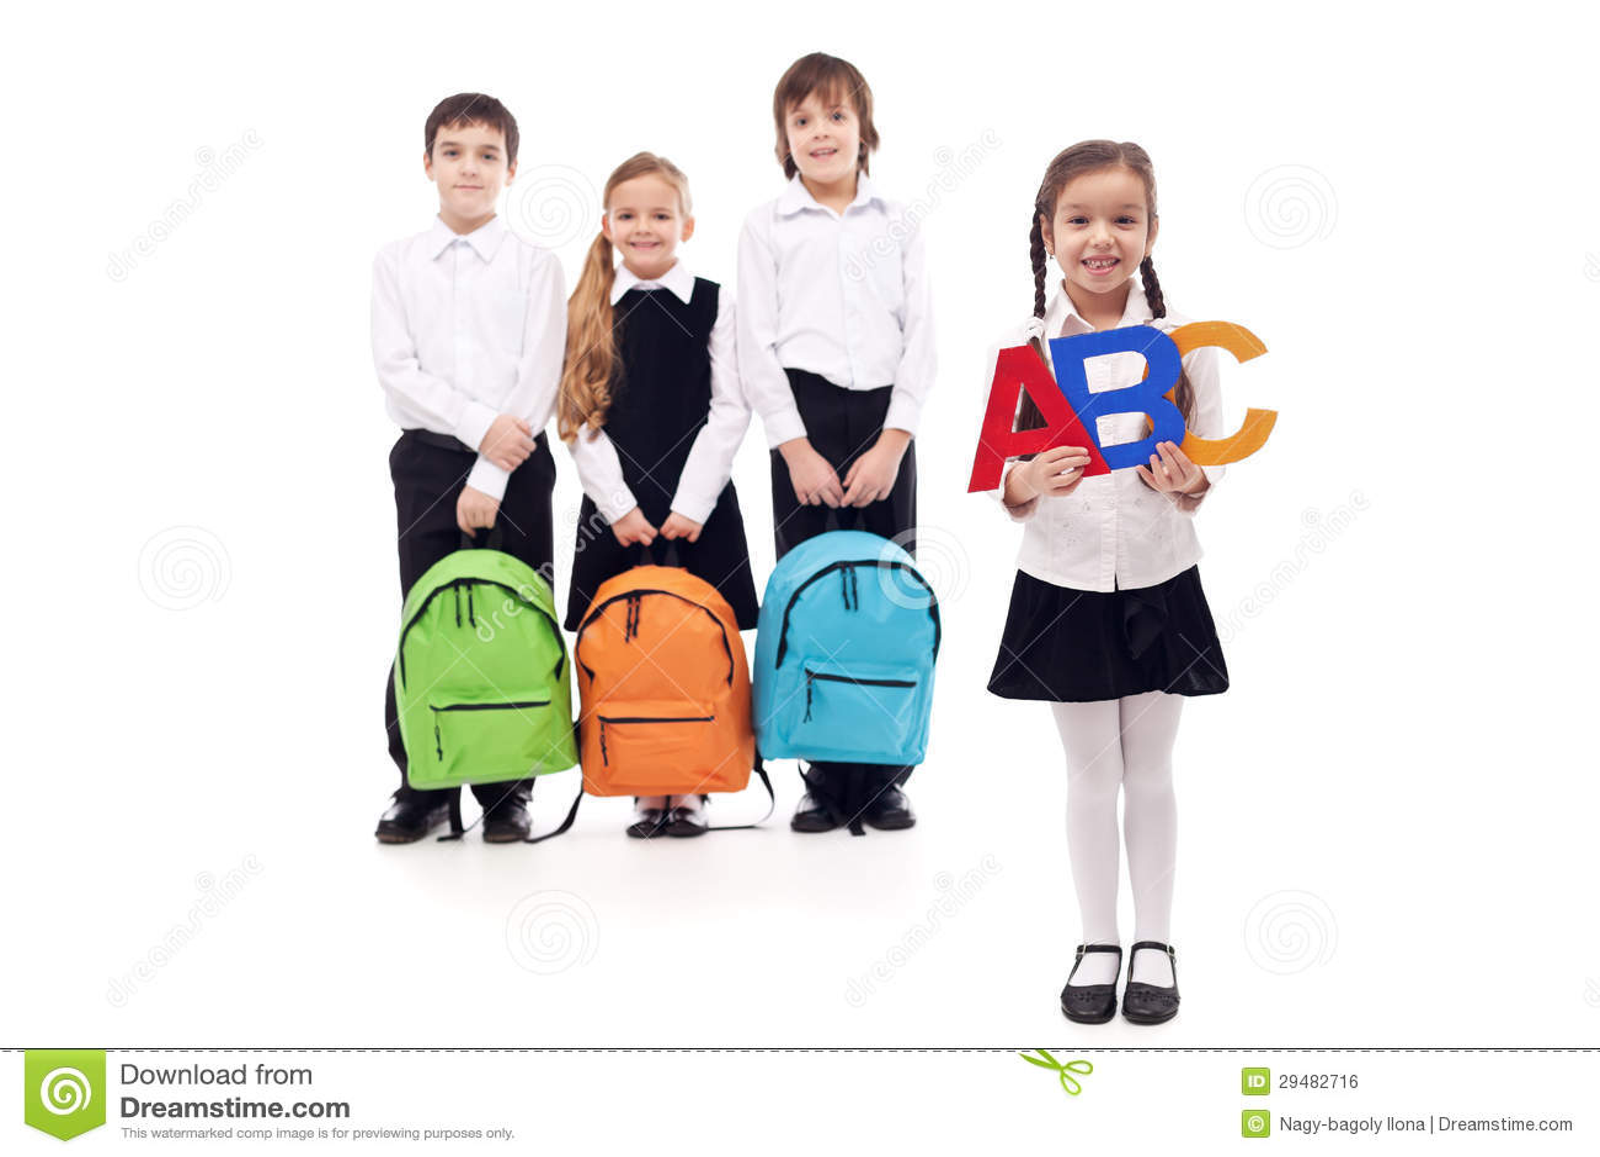 school children elementary school royalty free stock free footprint clipart images free sneaker footprint clipart